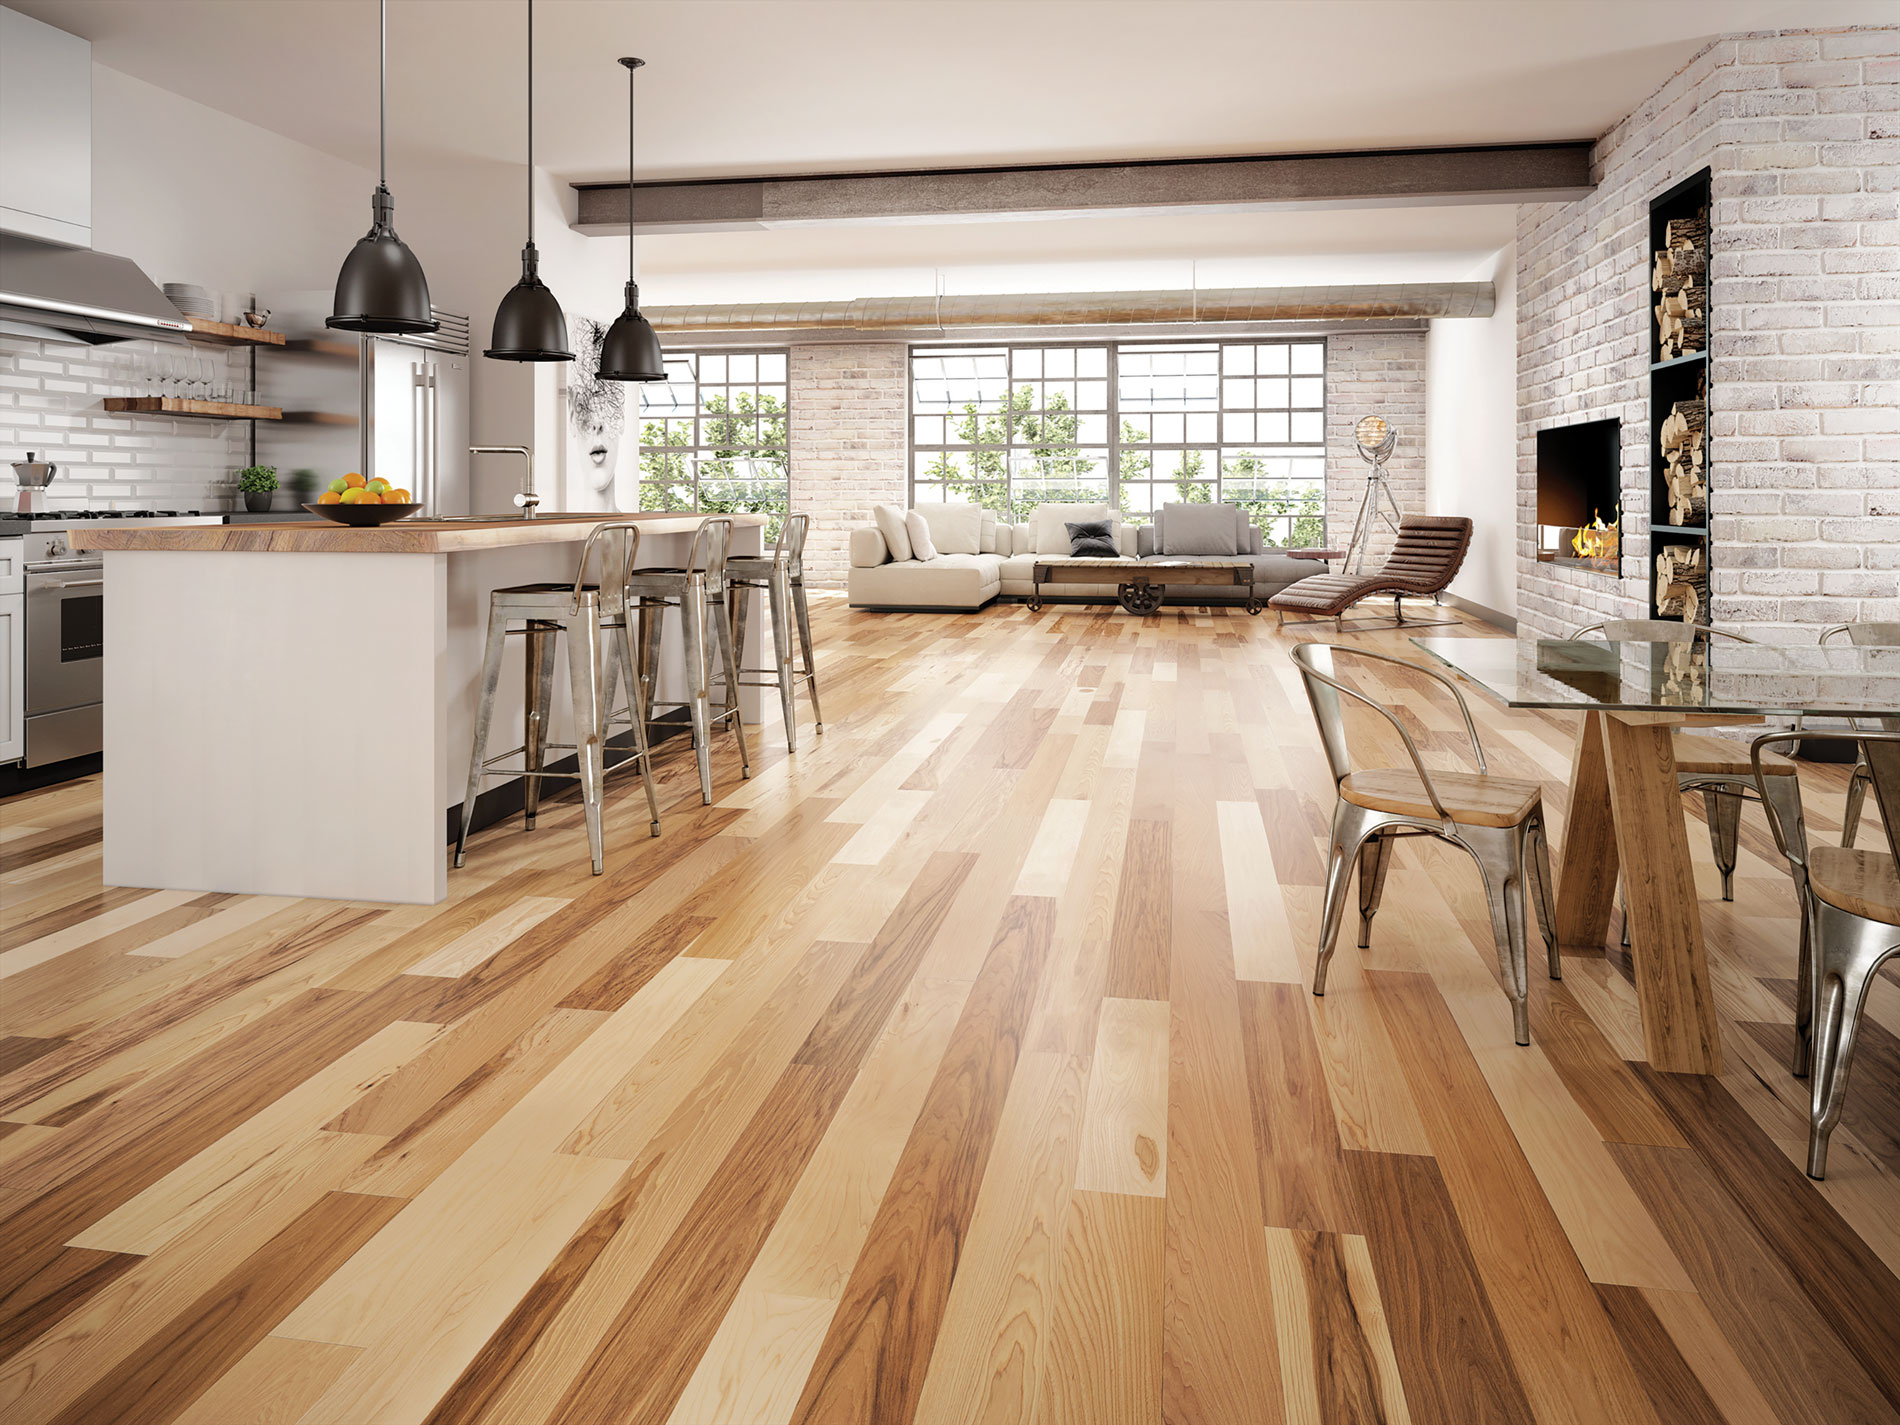 Hickory Hardwood Flooring Natural Emira